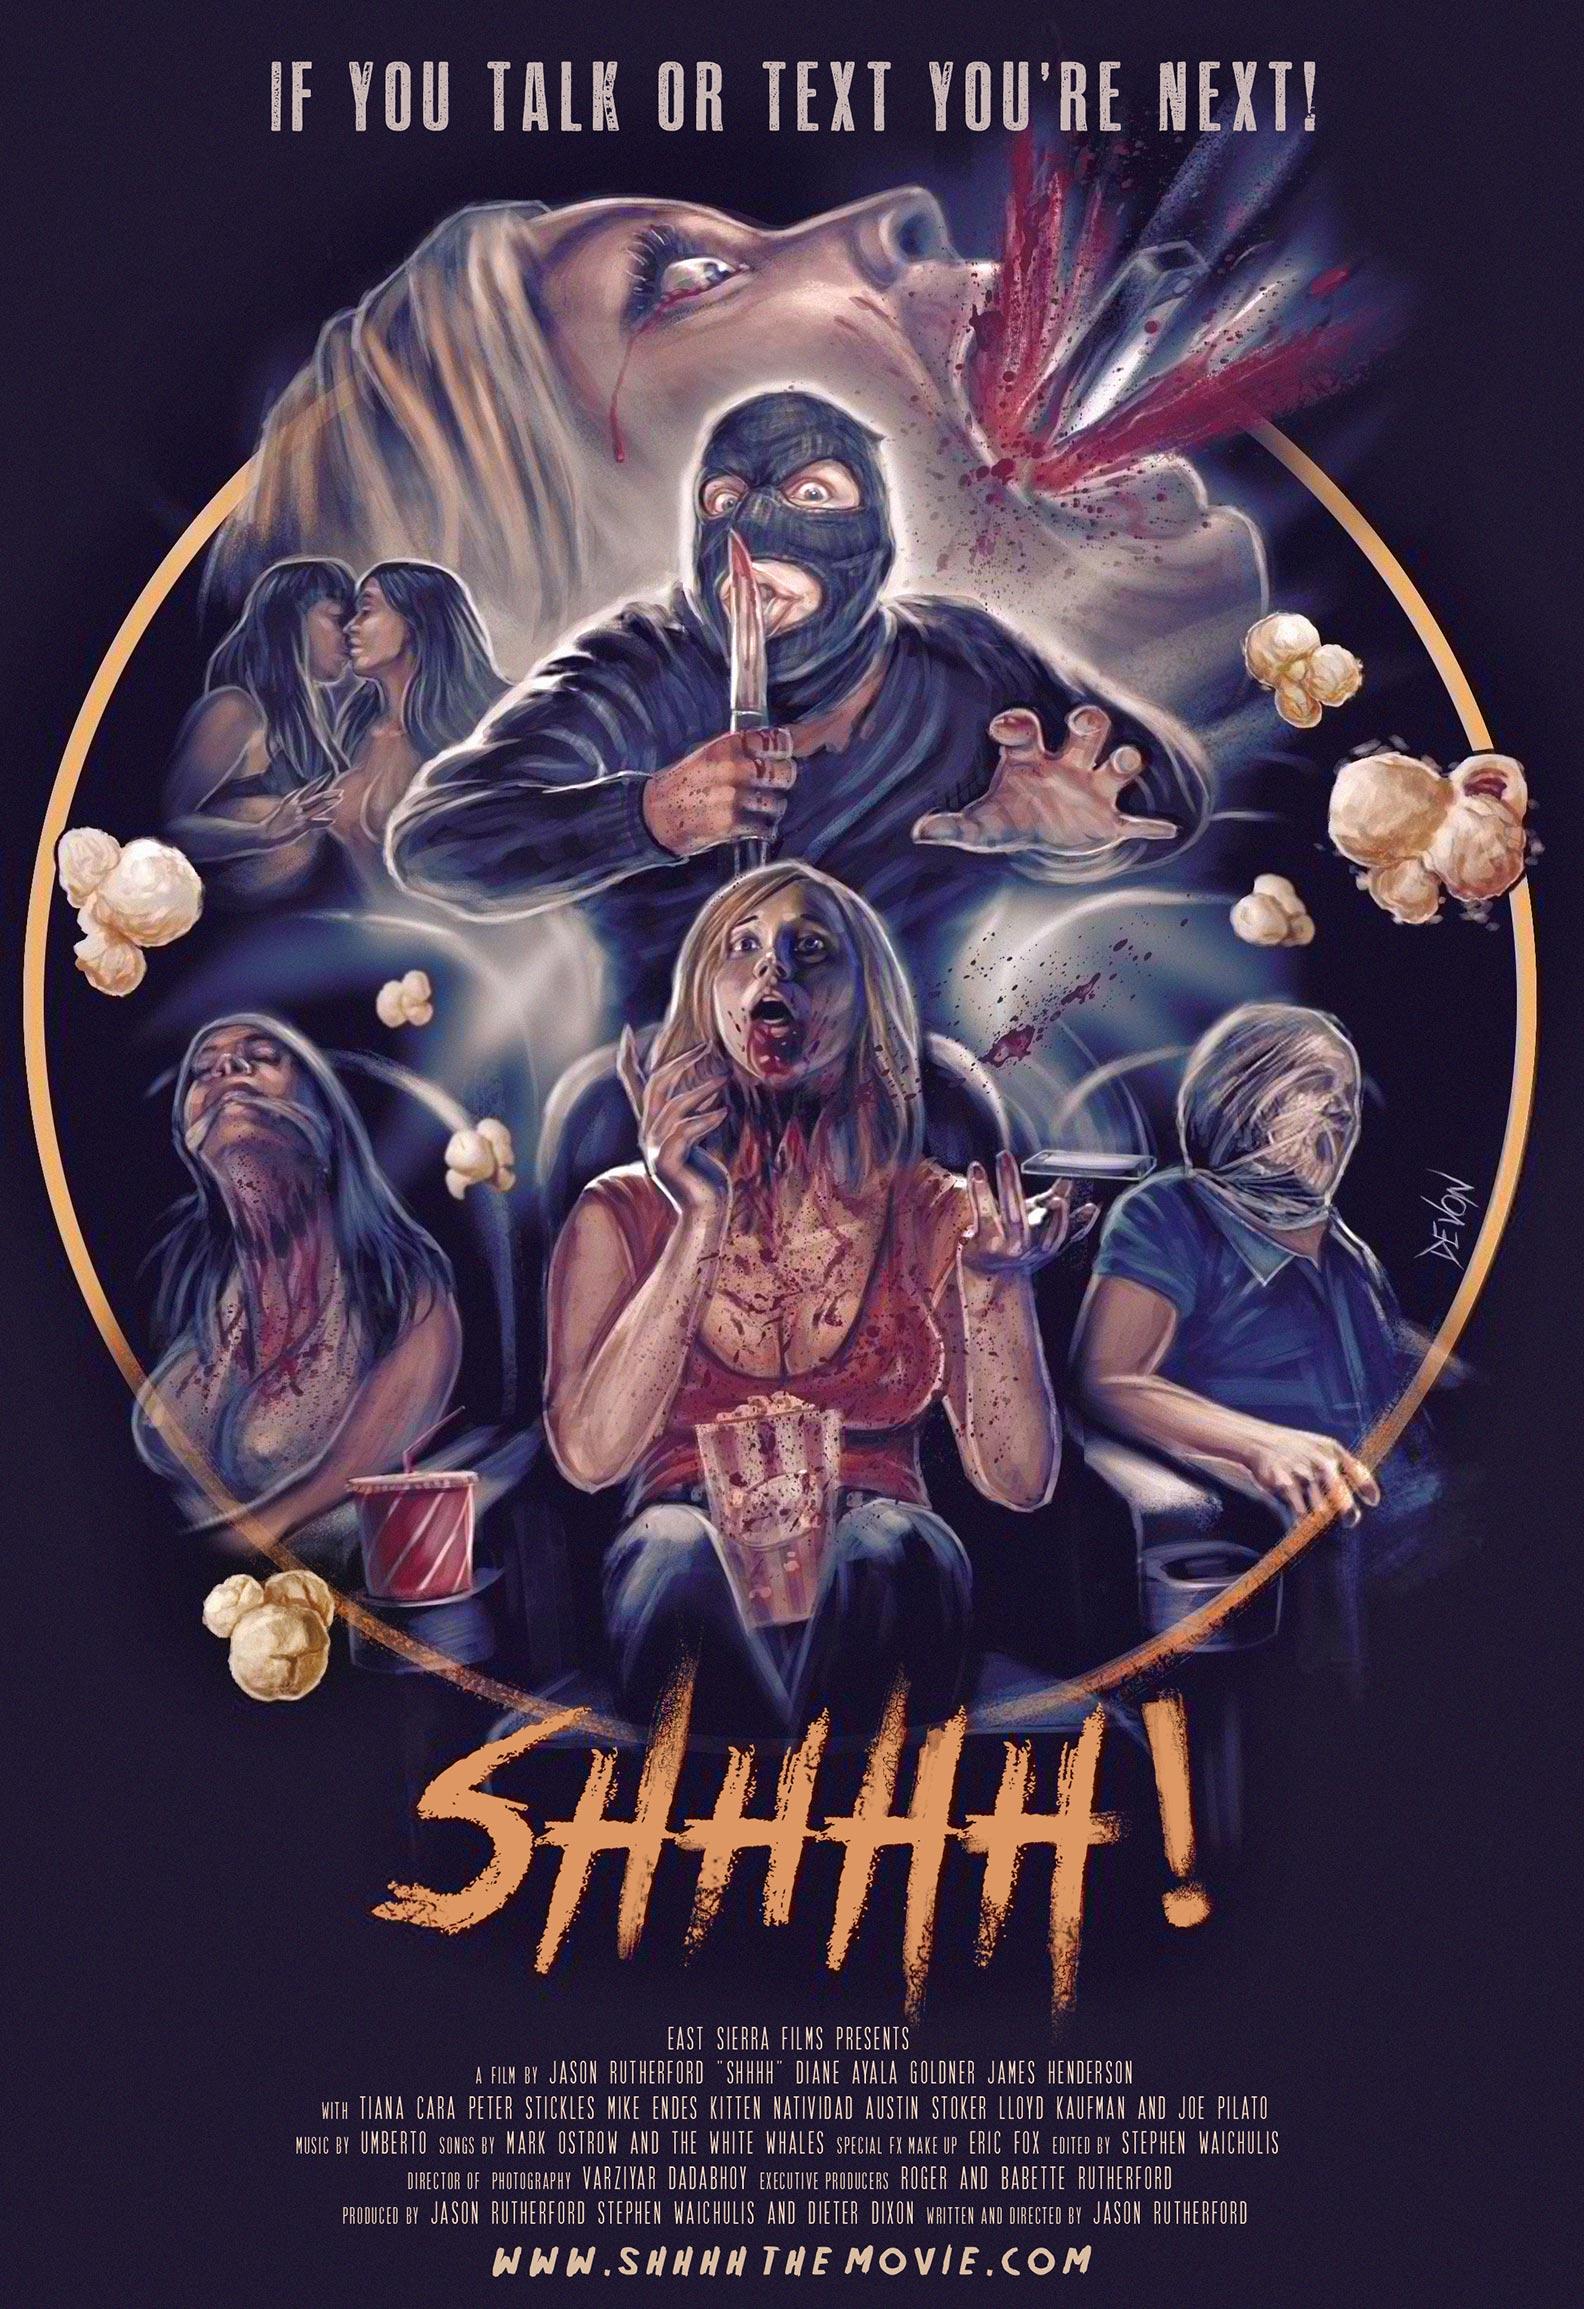 Shhhh Poster #1